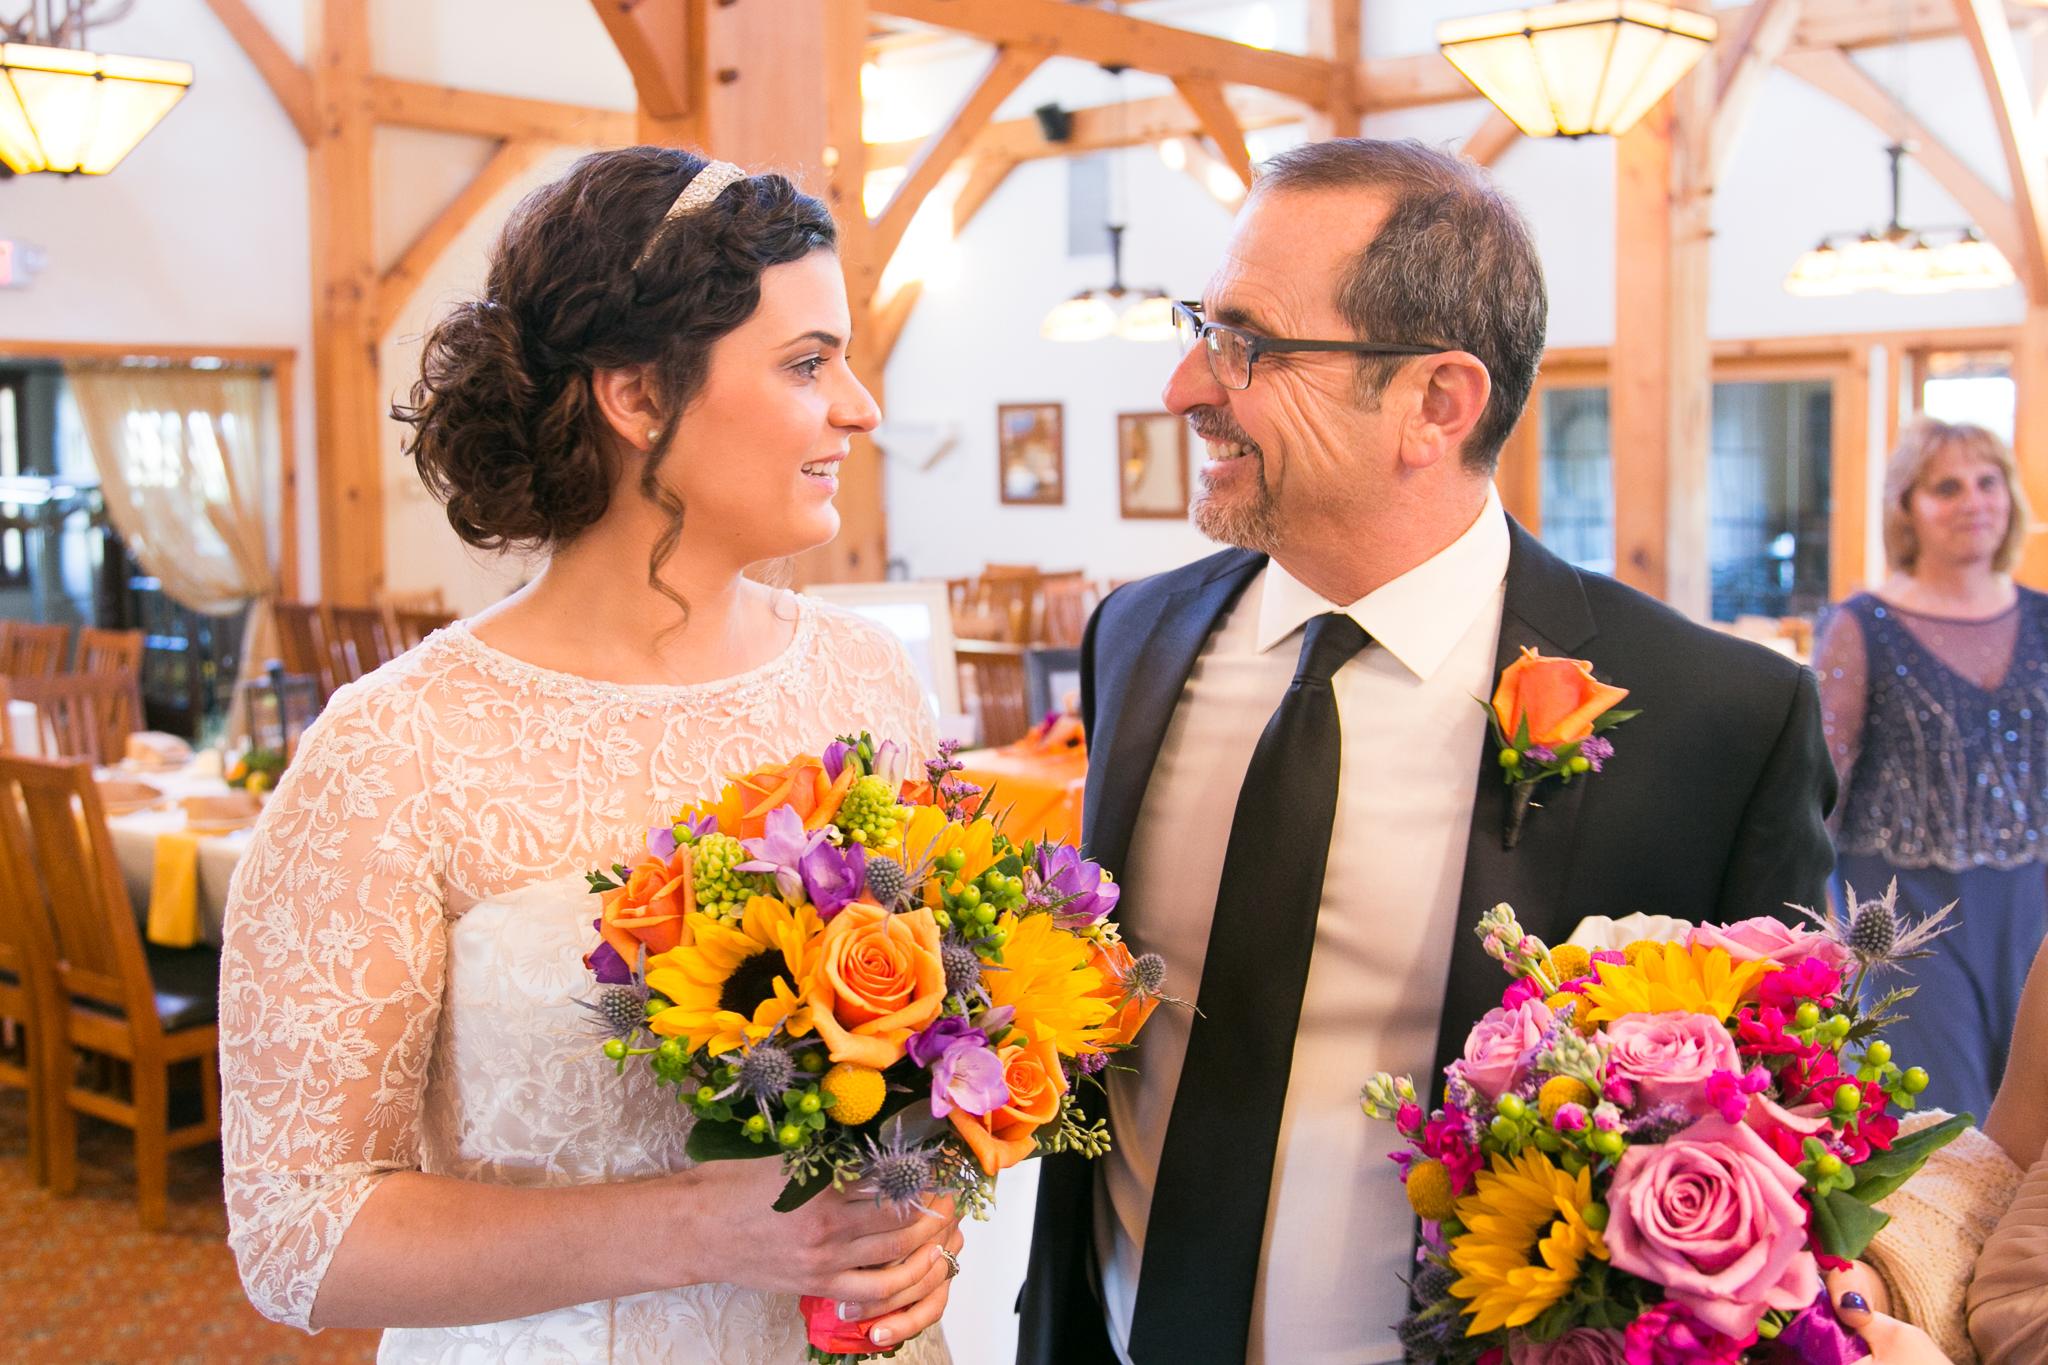 camuglia-whomstudio-chelsea_and_andy-nycphotographer-wedding-brooklyn-buffalo-timberlodge-018-5275.jpg